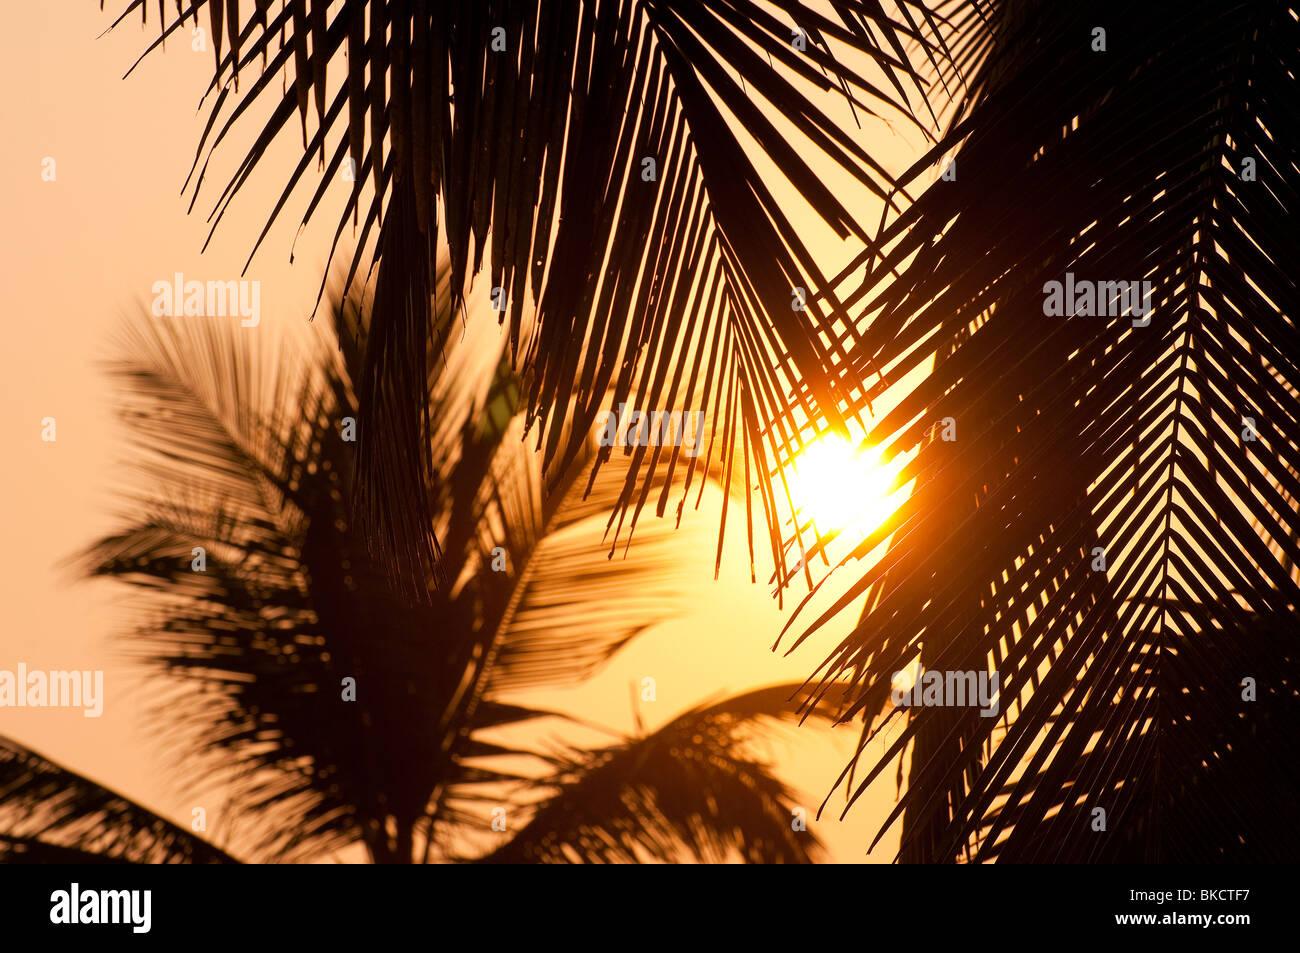 Sonnenuntergang mit Kokosnuss-Palmen, Hawa Strand, Kovalam, Kerala, Indien Stockbild